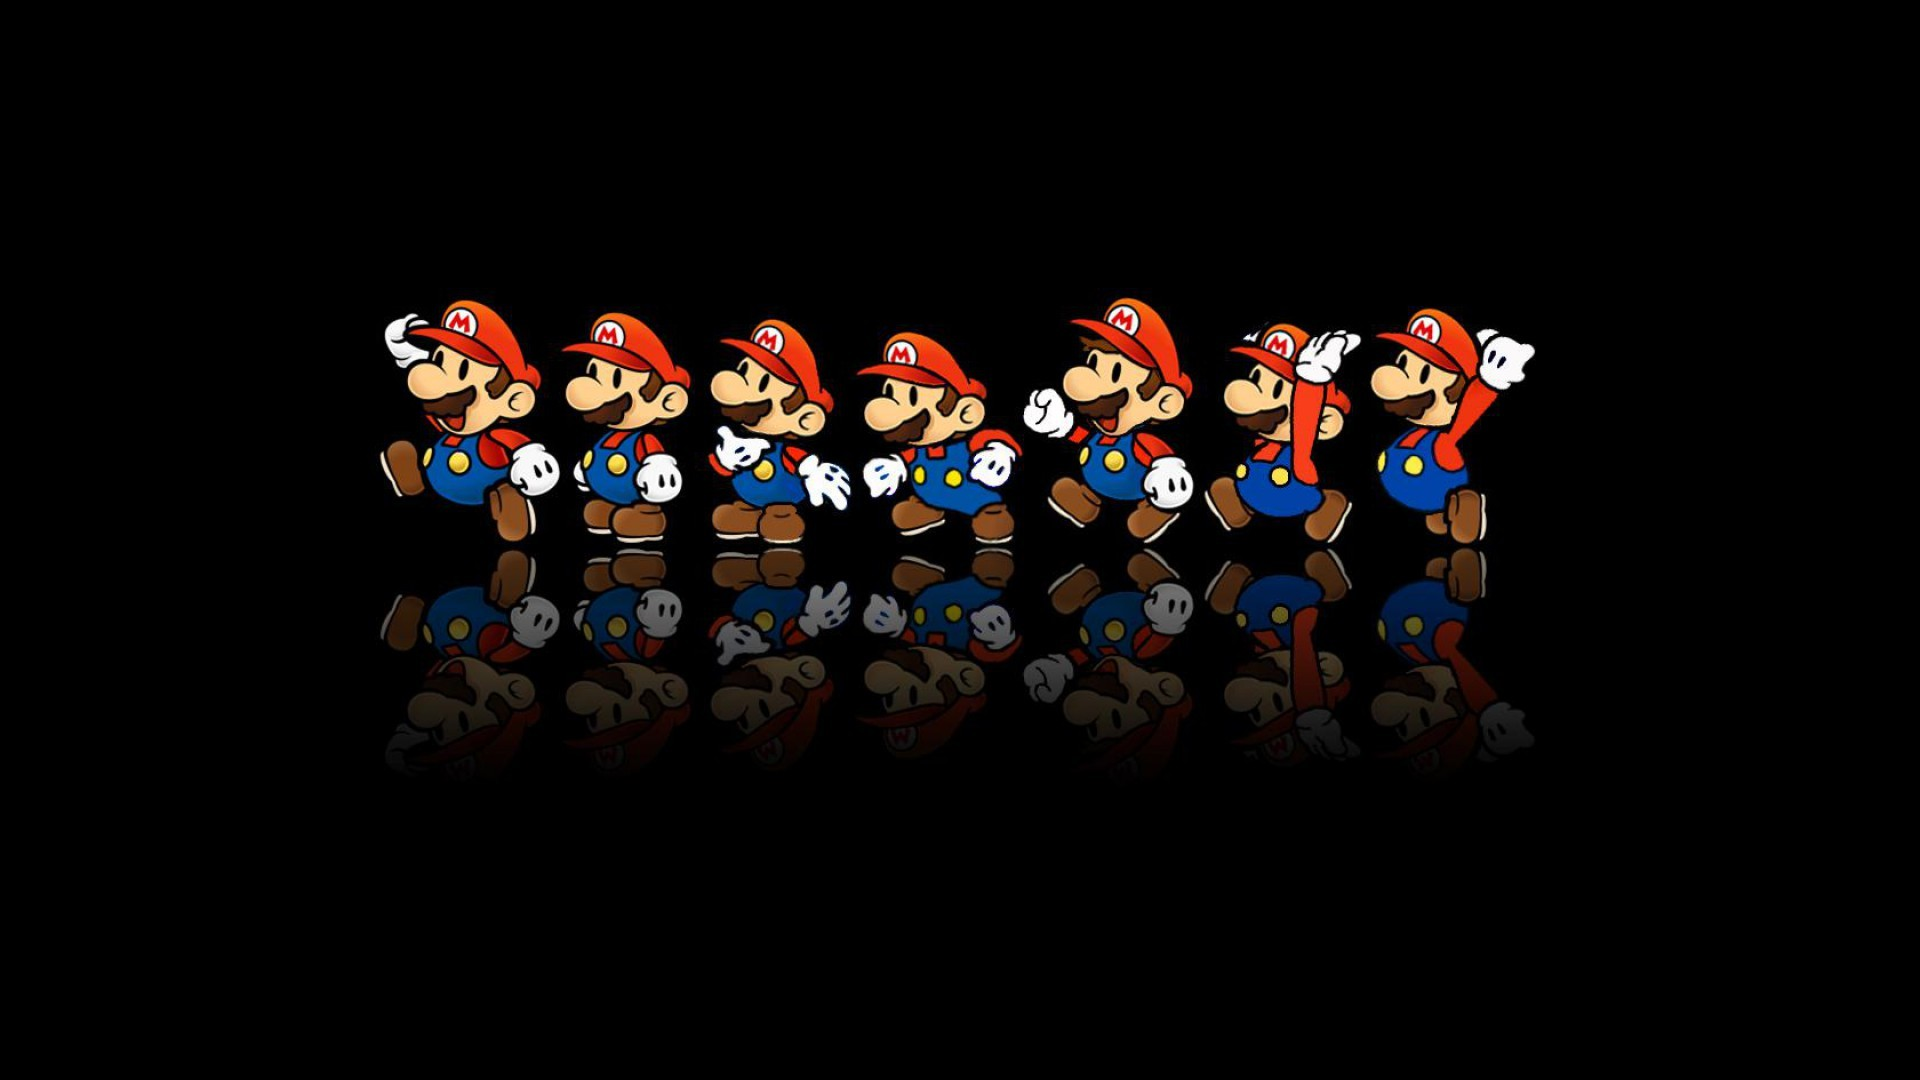 Games Wallpapers Mario Other Video Games Mario Wallpaper